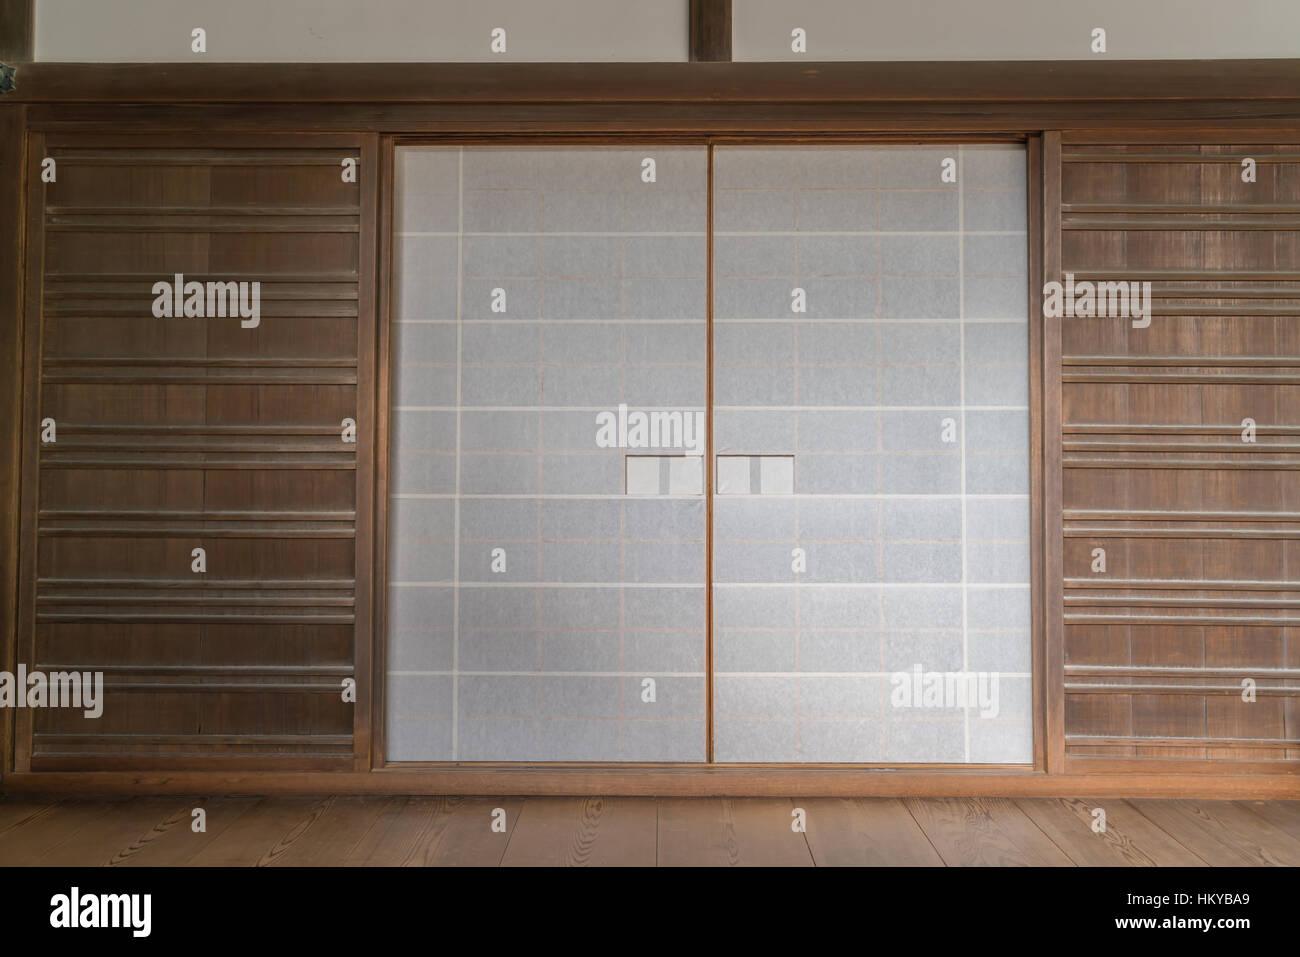 Japanese Screen Glass Room Stock Photos U0026 Japanese Screen ...